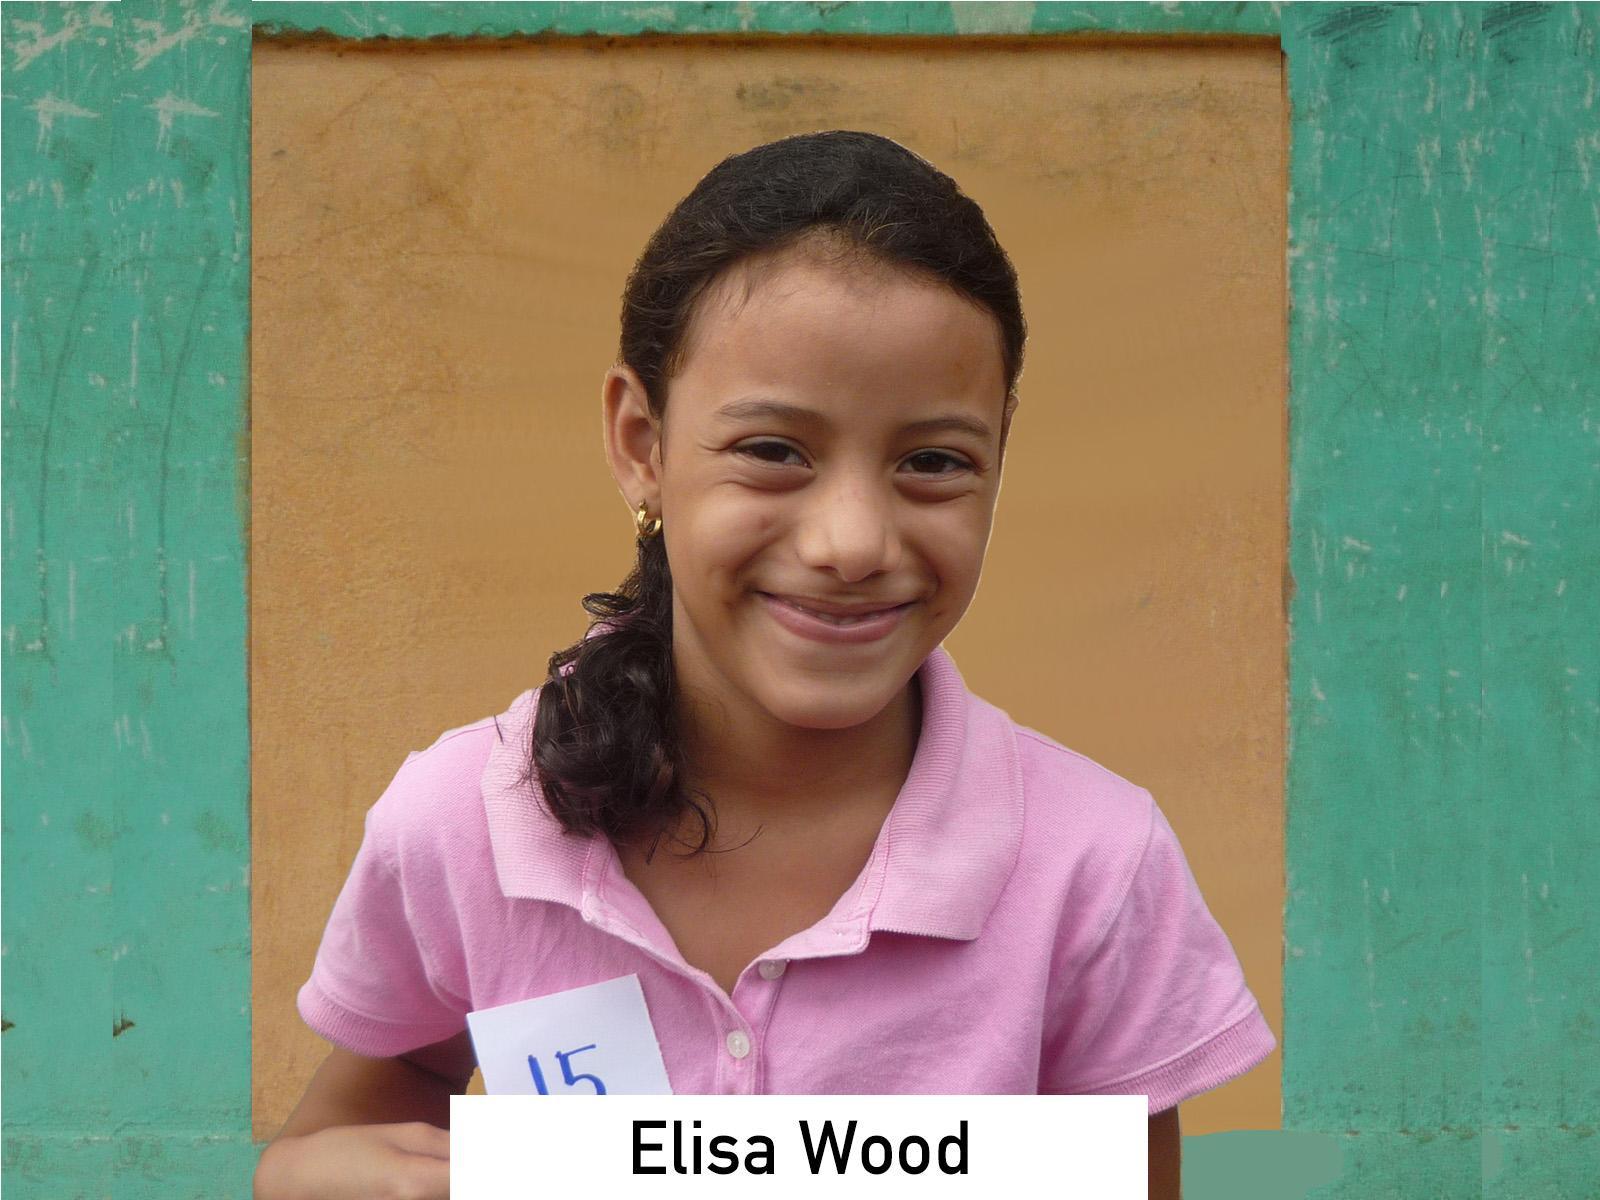 015 - Elisa Wood.jpg